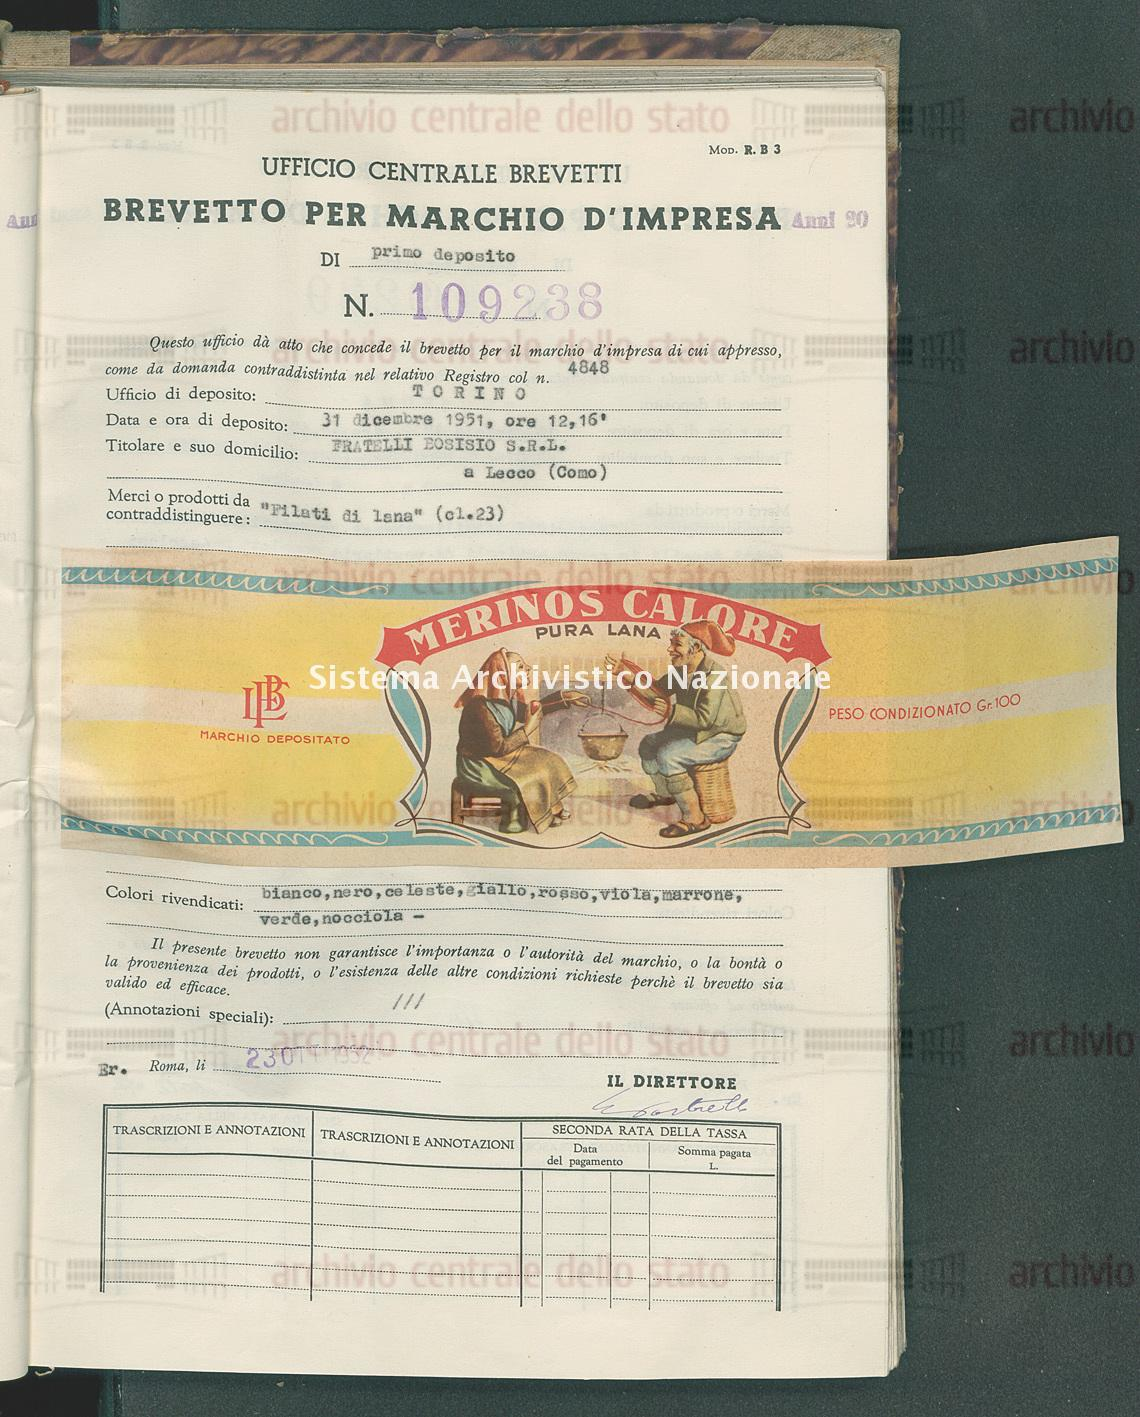 'Filati di lana' Fratelli Bosisio S.R.L. (23/10/1952)